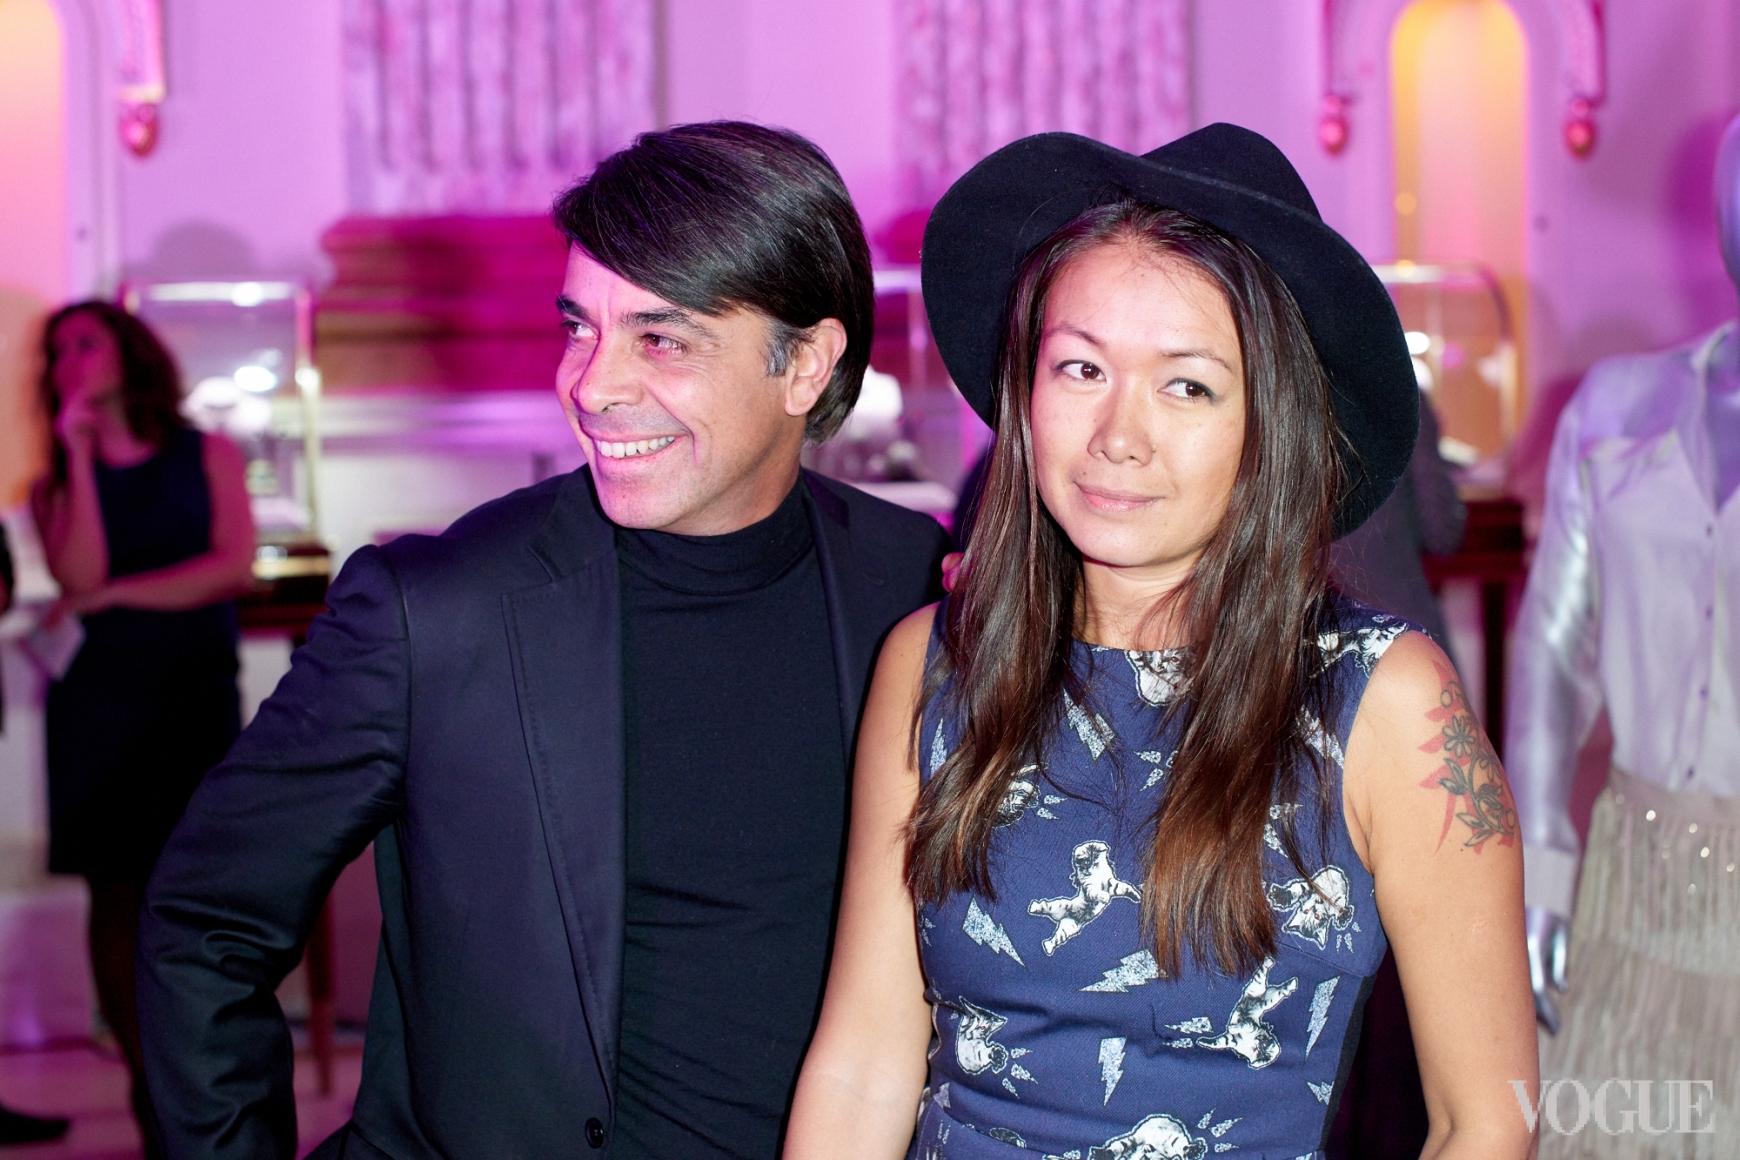 Валид Арфуш и Лида Петрова